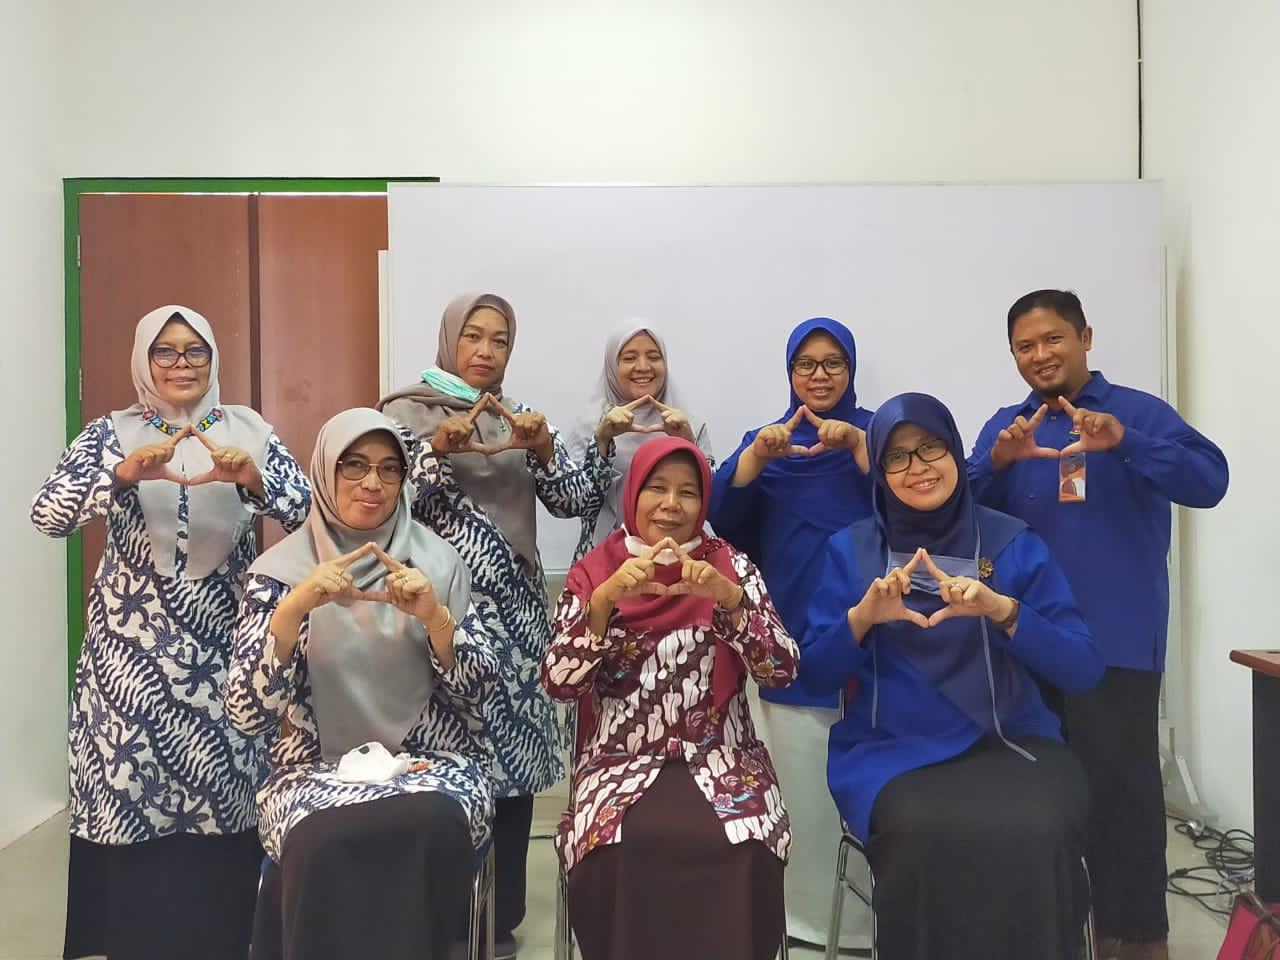 Pengurus Himpunan Pendidik dan Tenaga Kependidikan Anak Usia Dini Indonesia (Himpaudi) Kota Balikpapan melakukan kunjungan ke Kampus Universitas Mulia, Rabu (17/3)